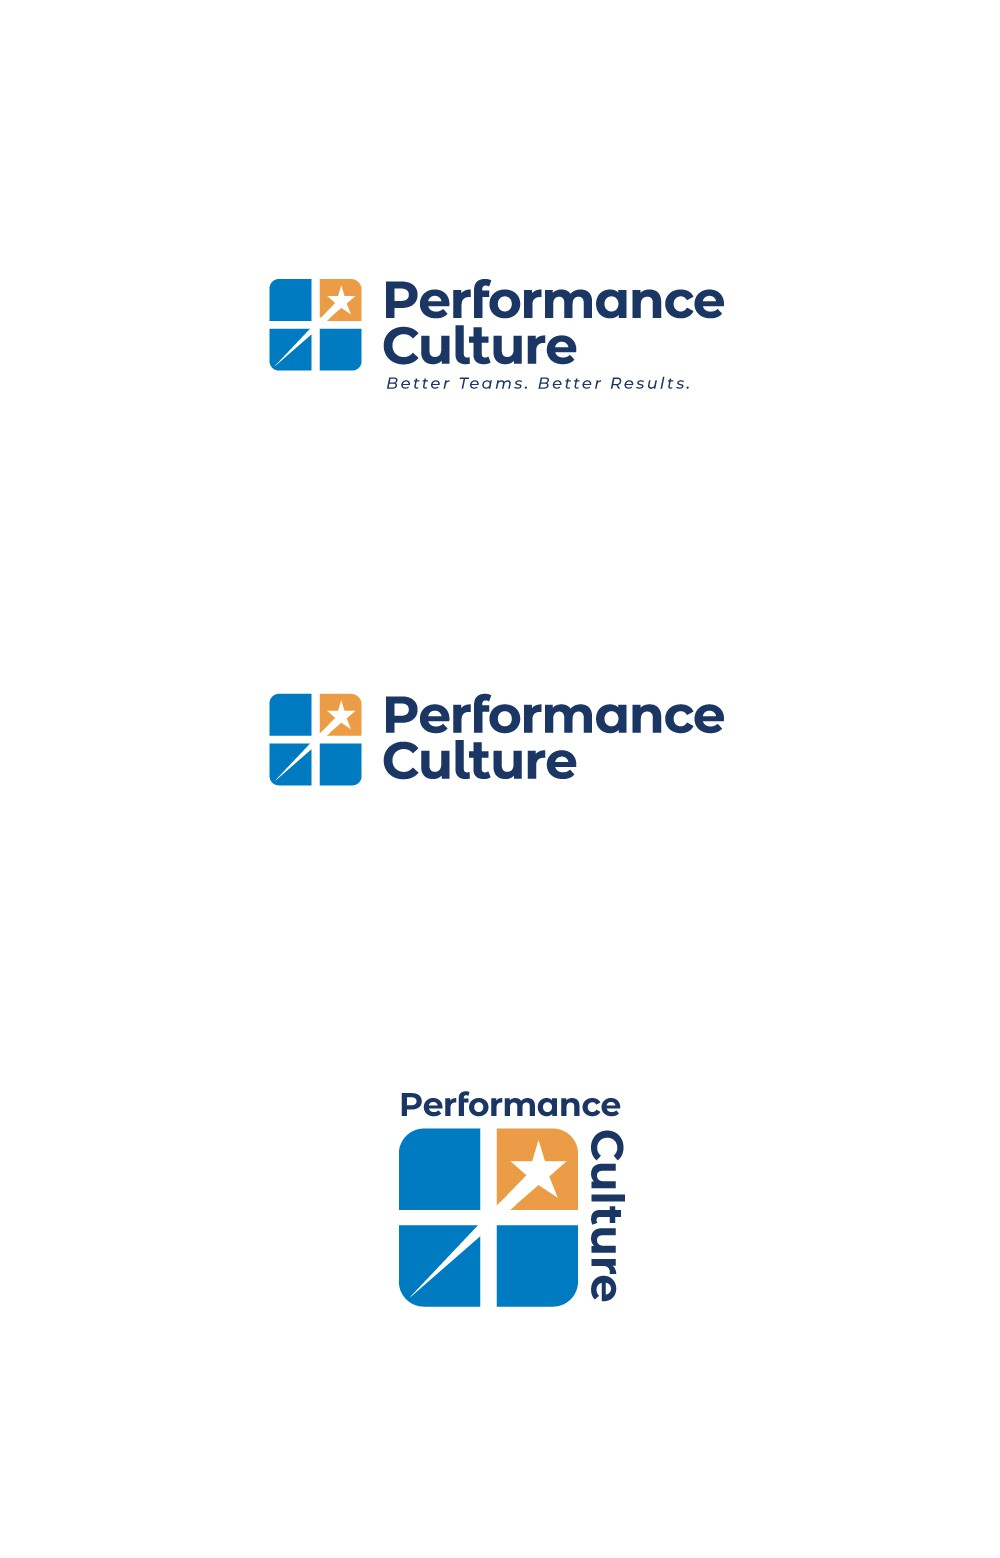 New Performance Culture logo